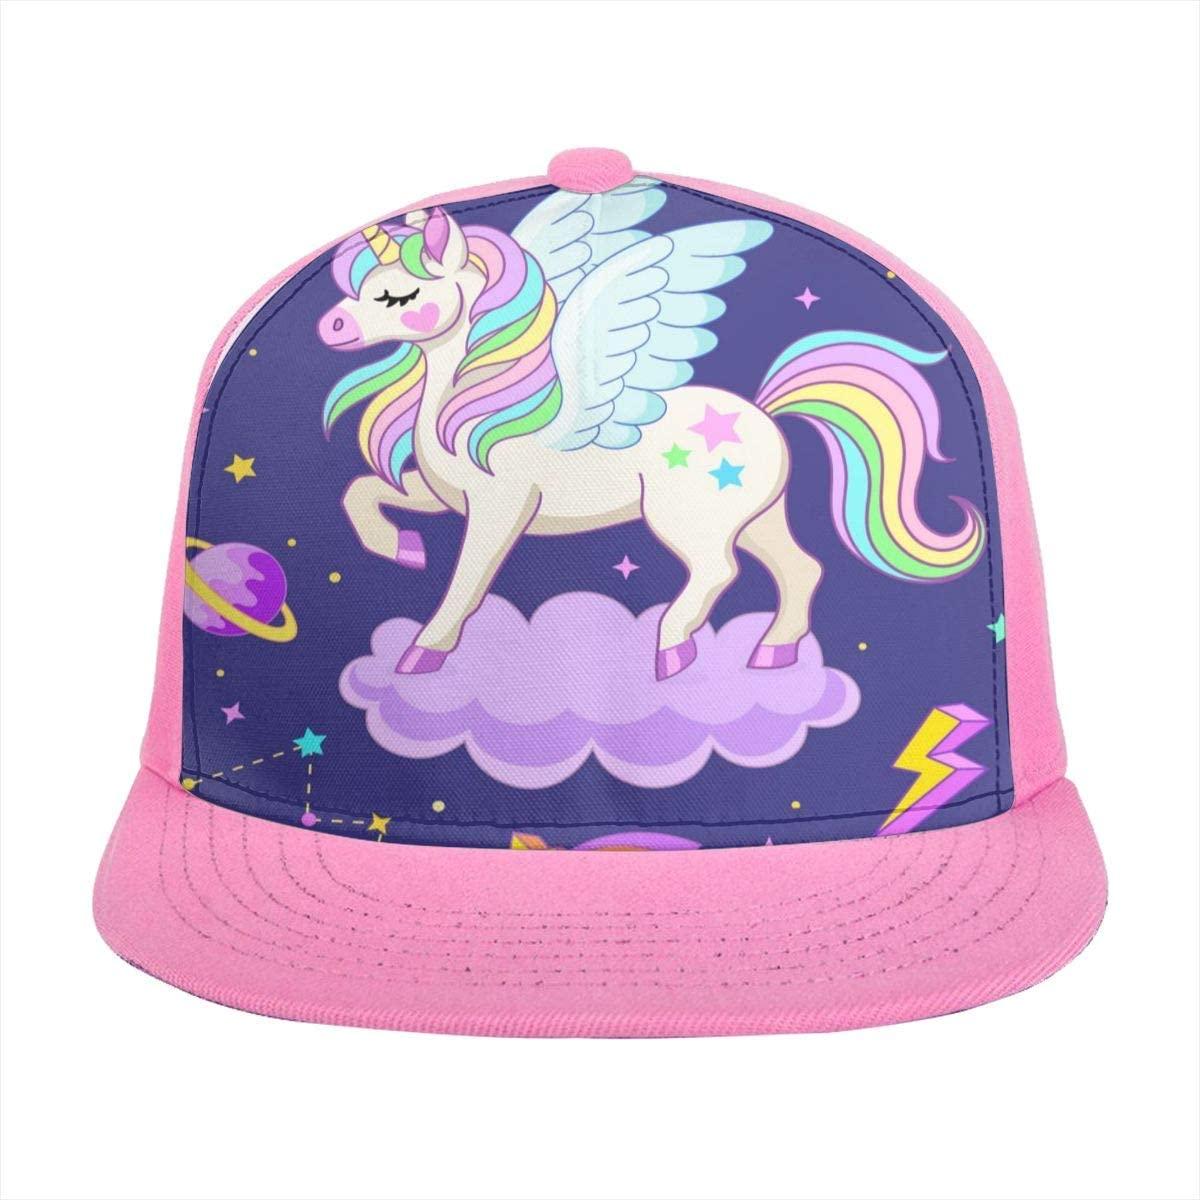 SLHFPX Baseball Cap Cute Unicon Pegasus On Cloud with Rocket Sun Trucker Hats for Women Men Girls Boys Summer